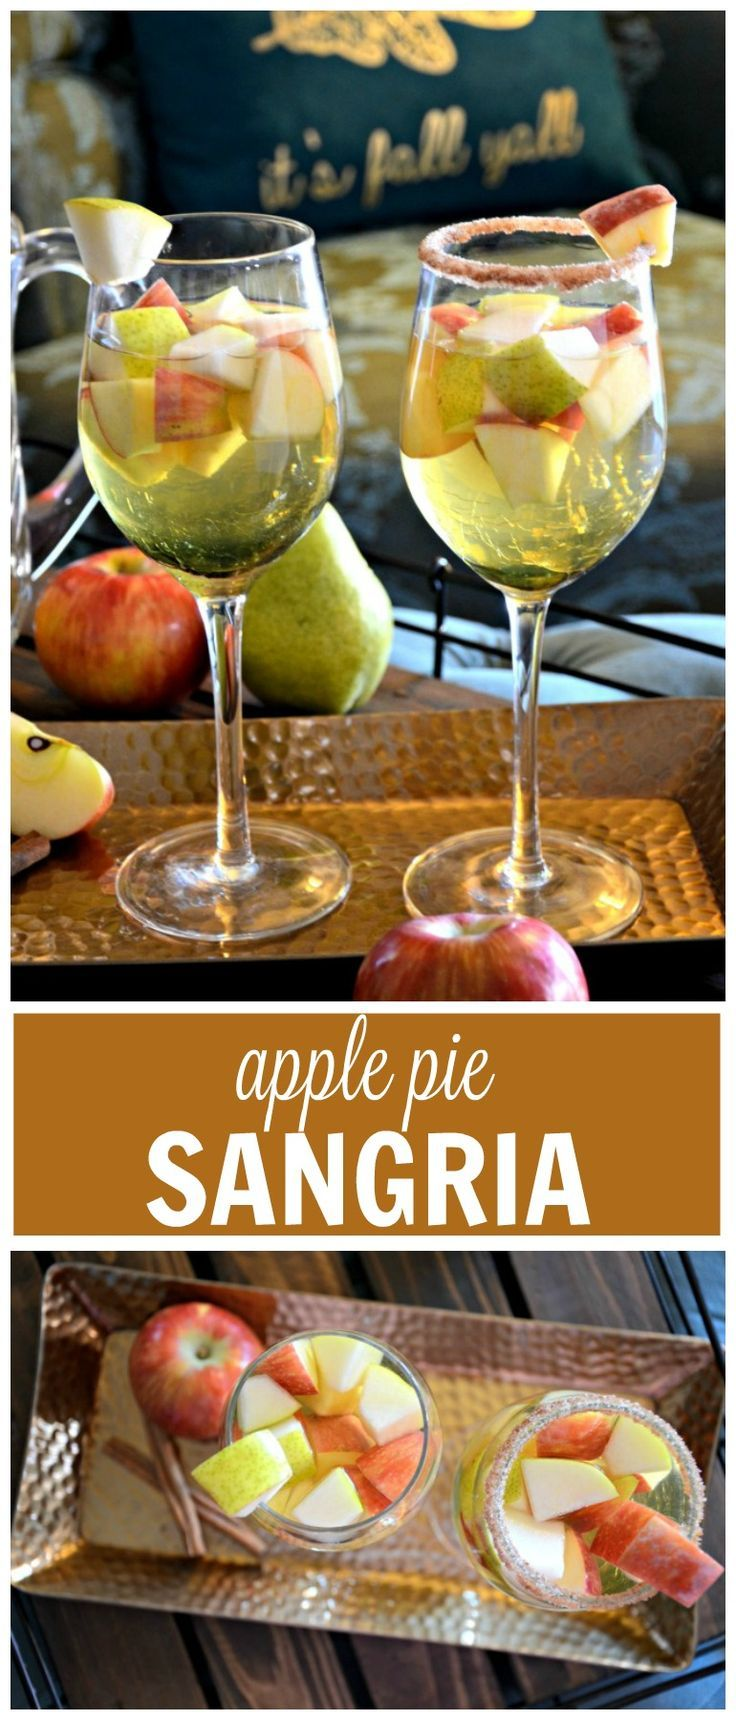 Comfortable Autumn Apple Pie Sangria Apple Pie Sangria Saturday Apple Pie Sangria Autumn Saturday Apple Pie Sangria Fireball Apple Pie Vodka Sangria nice food Apple Pie Sangria